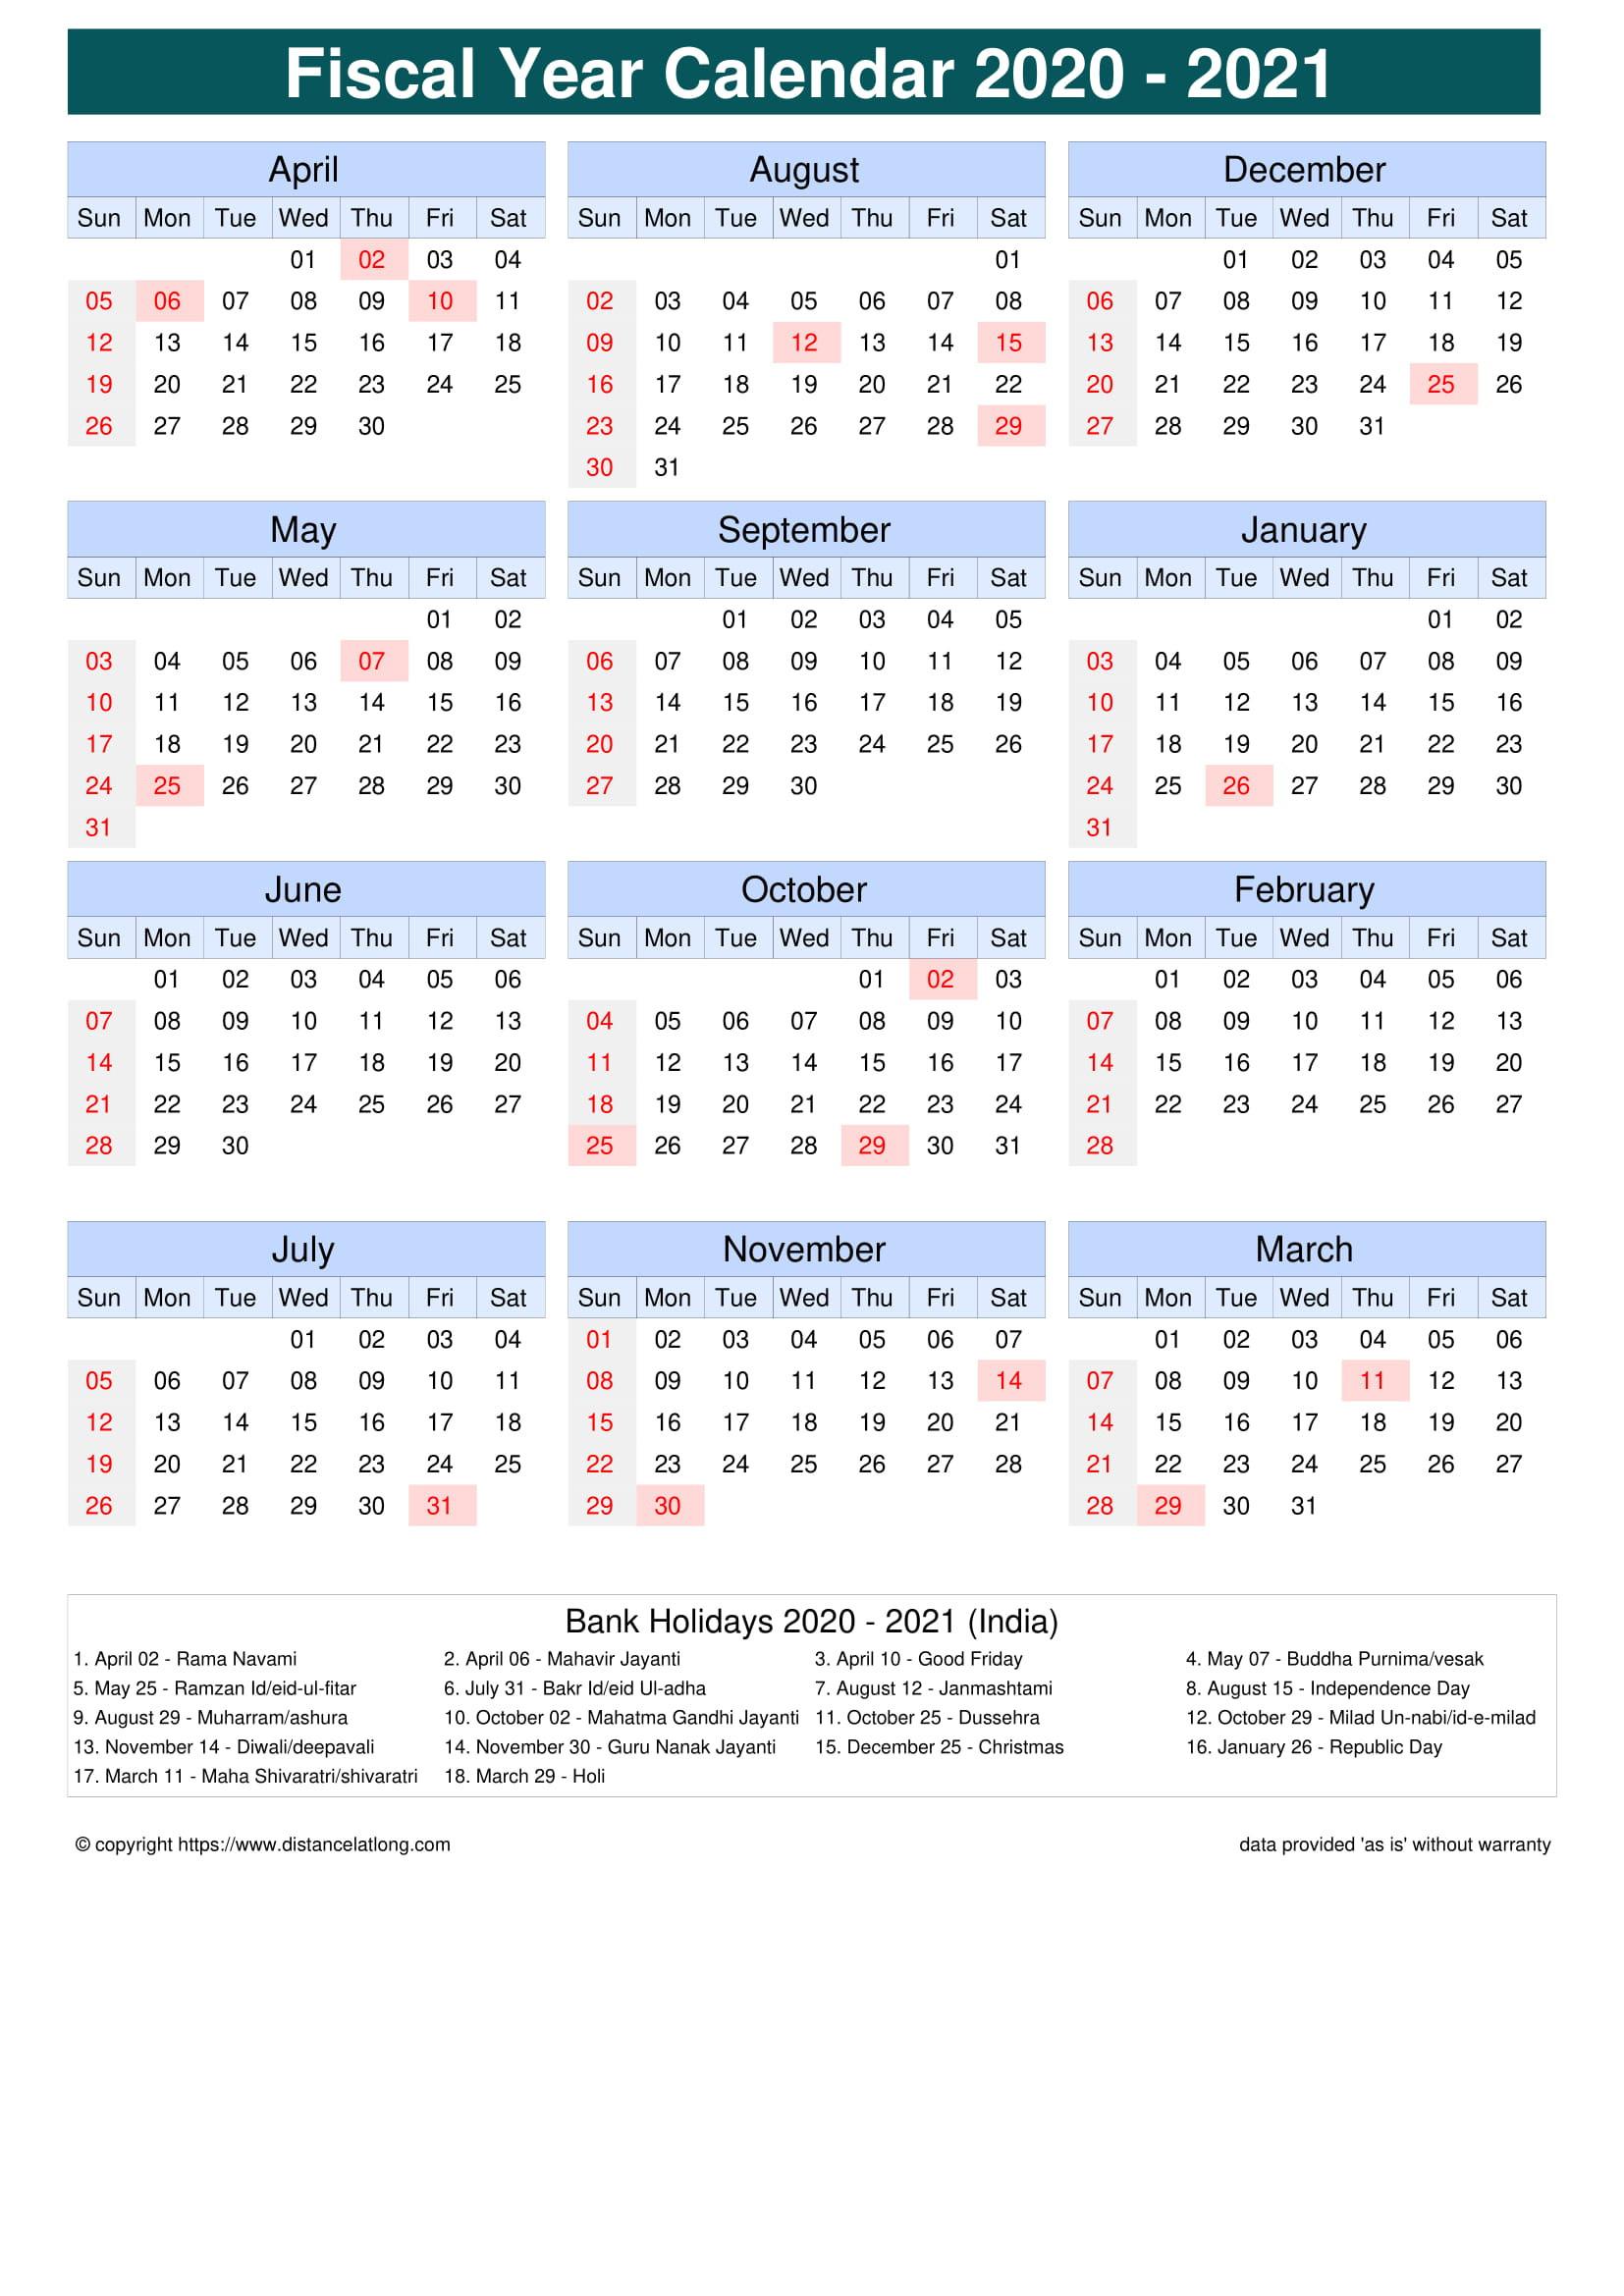 Holiday Calendar 2021 India | Printable Calendars 2021-2021 Calendard For Vacation Schedule